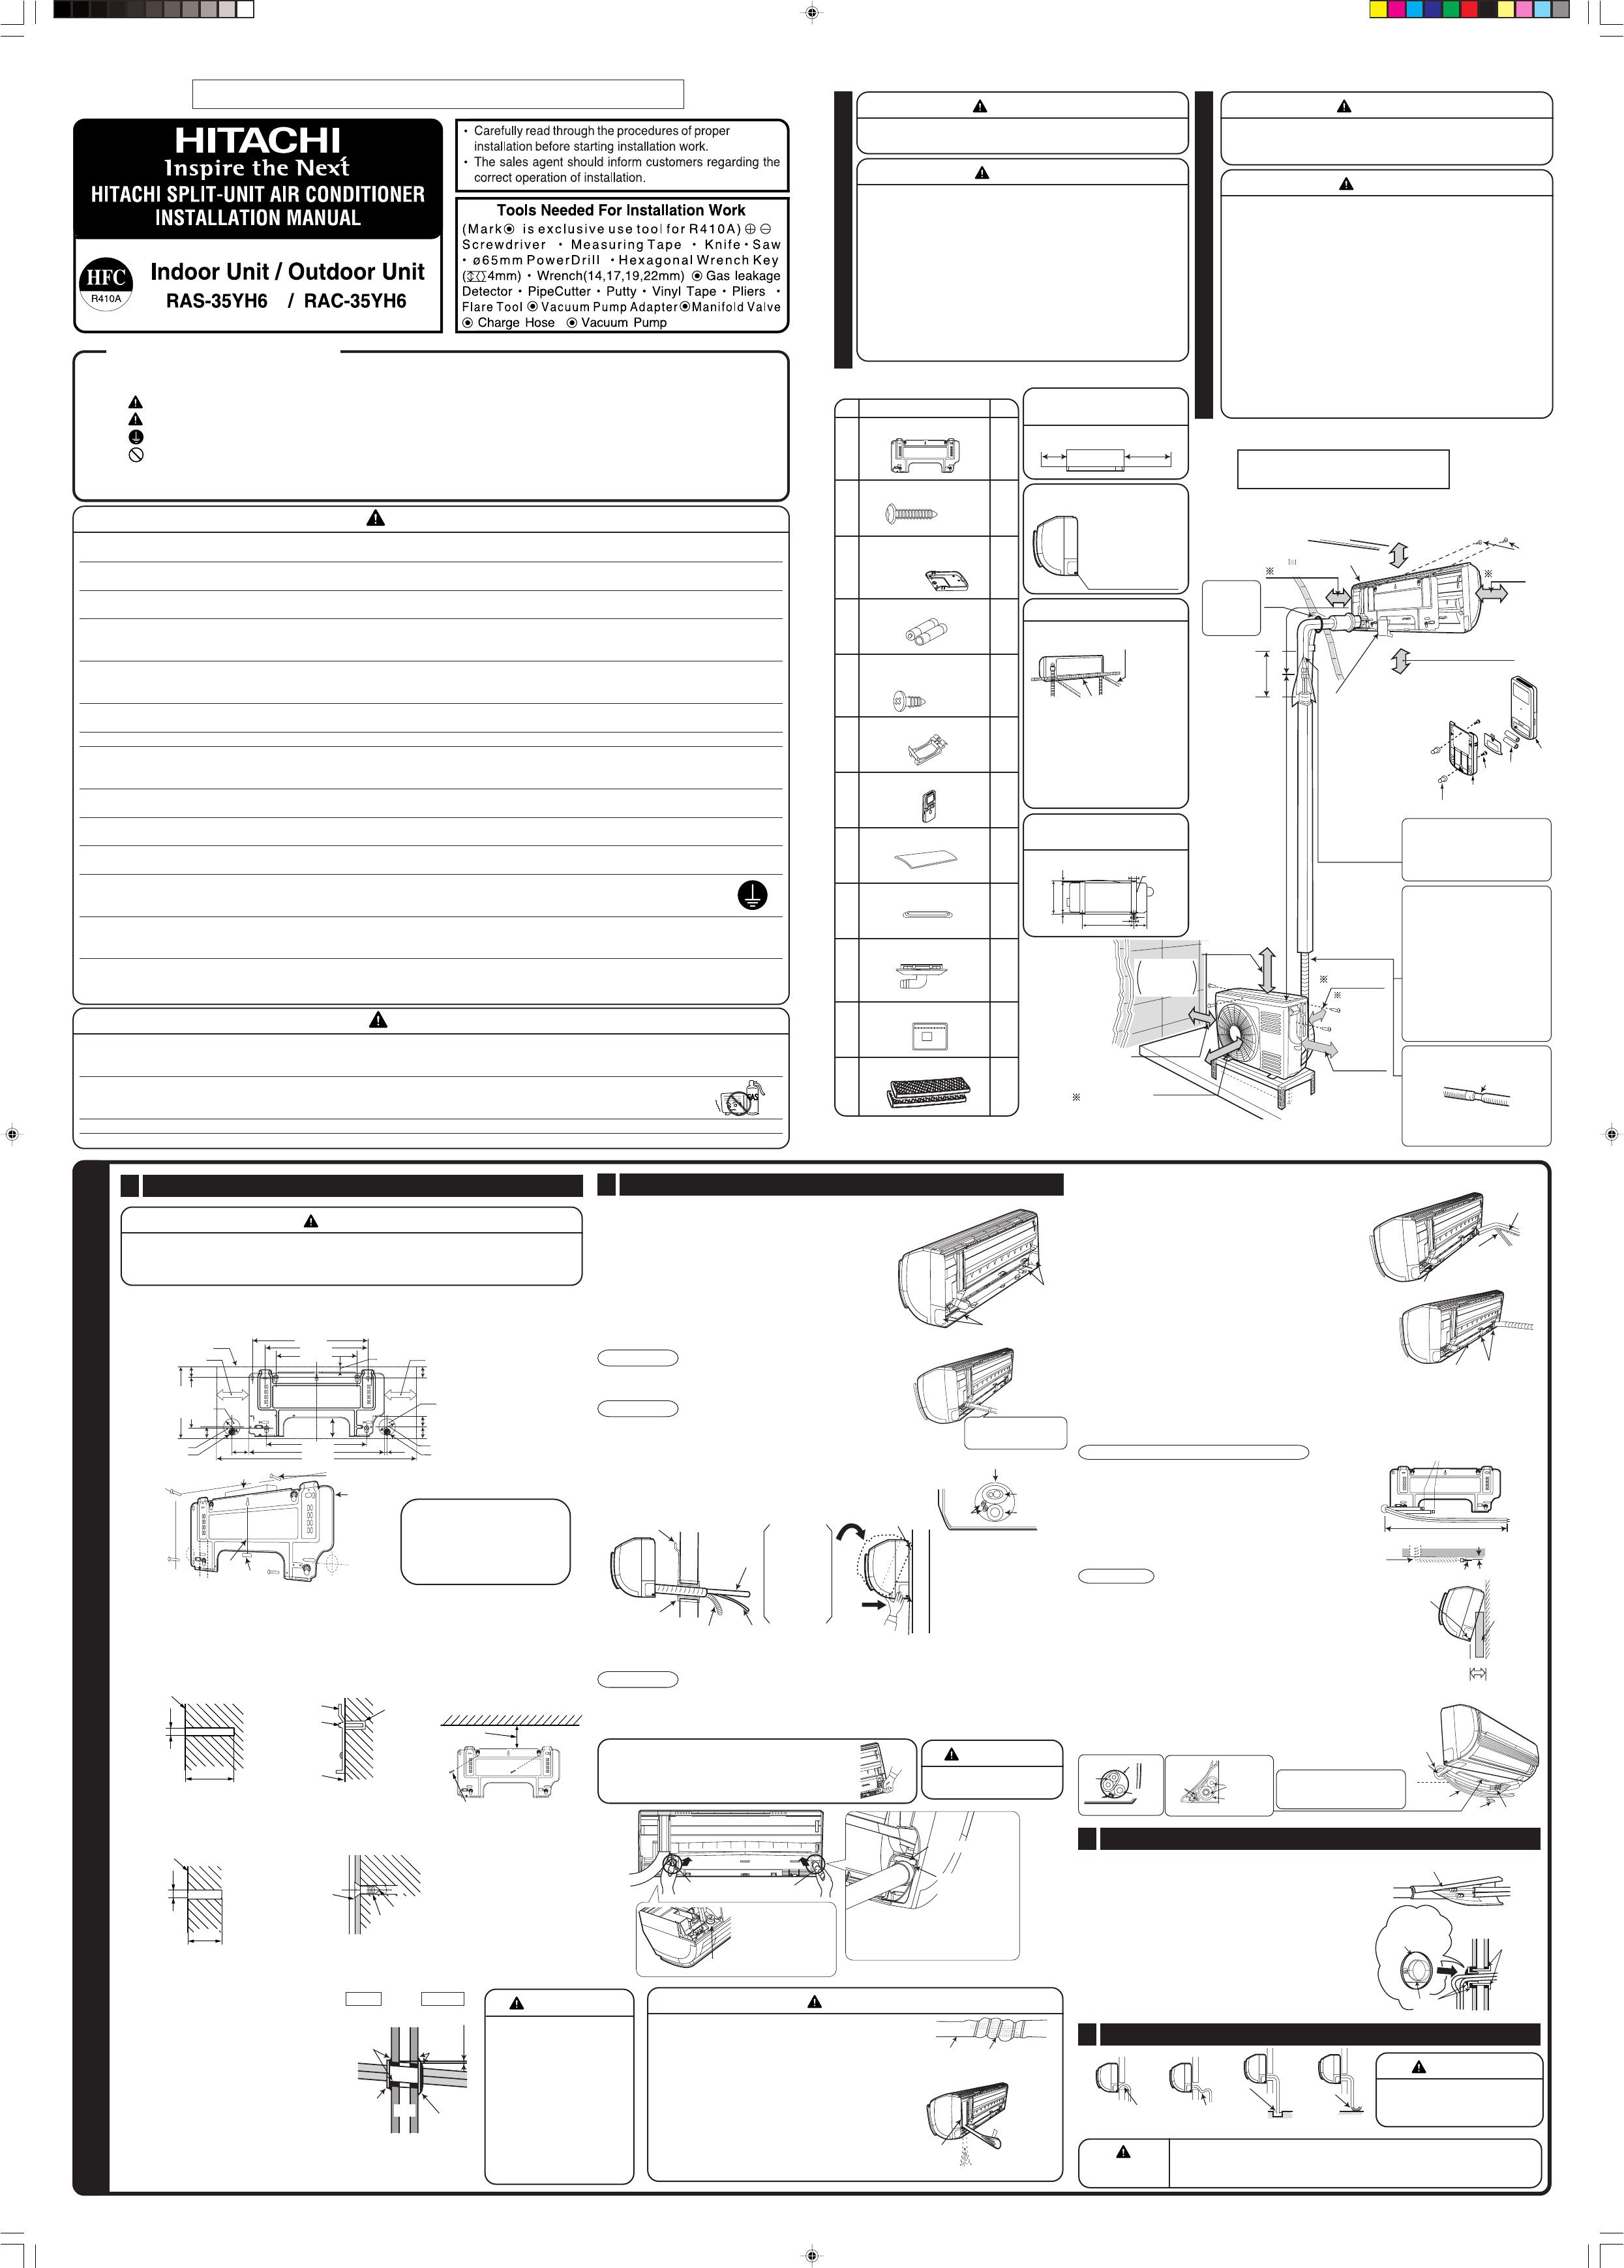 Rj45 To Rj11 Adapter Wiring Diagram -|- Vinny.oleo-Vegetal - Cat5 B Wiring Diagram